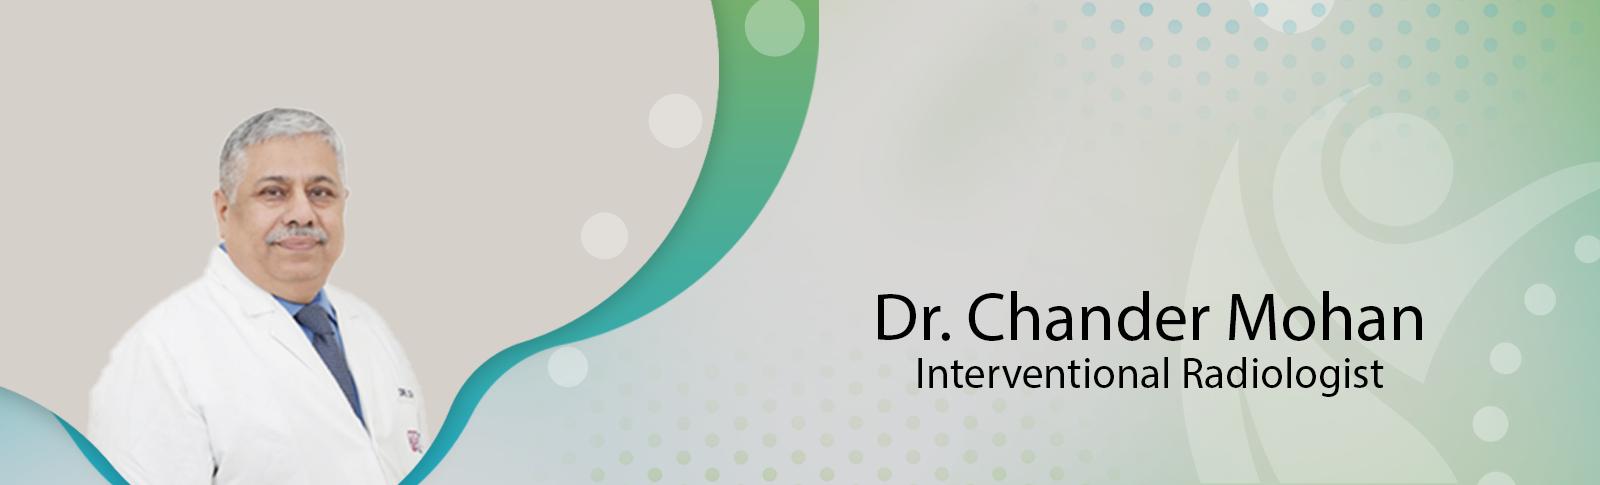 Dr. Chander Mohan